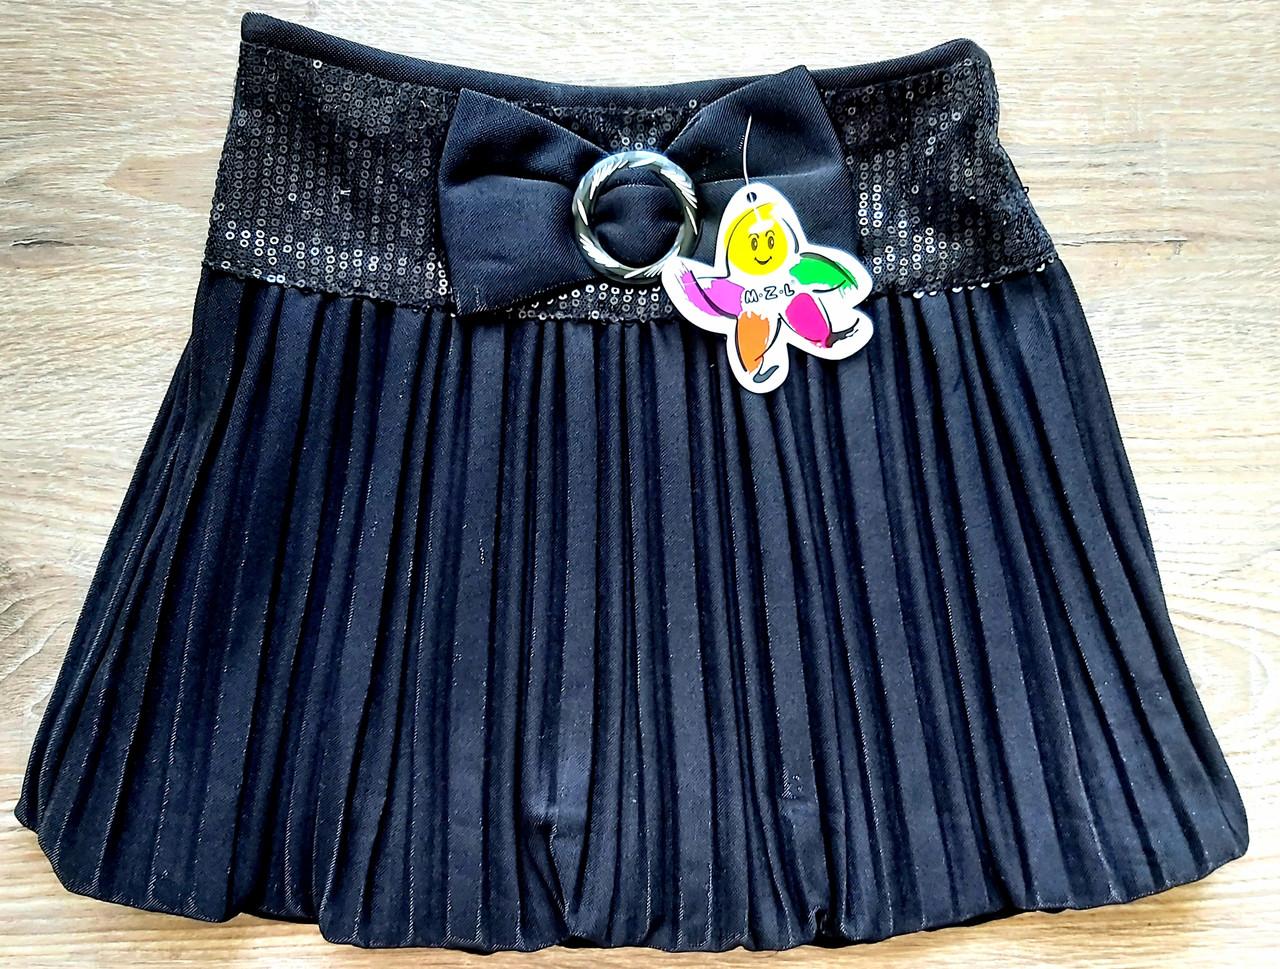 Школьная расклешенная нарядная юбочка чёрная с пайетками